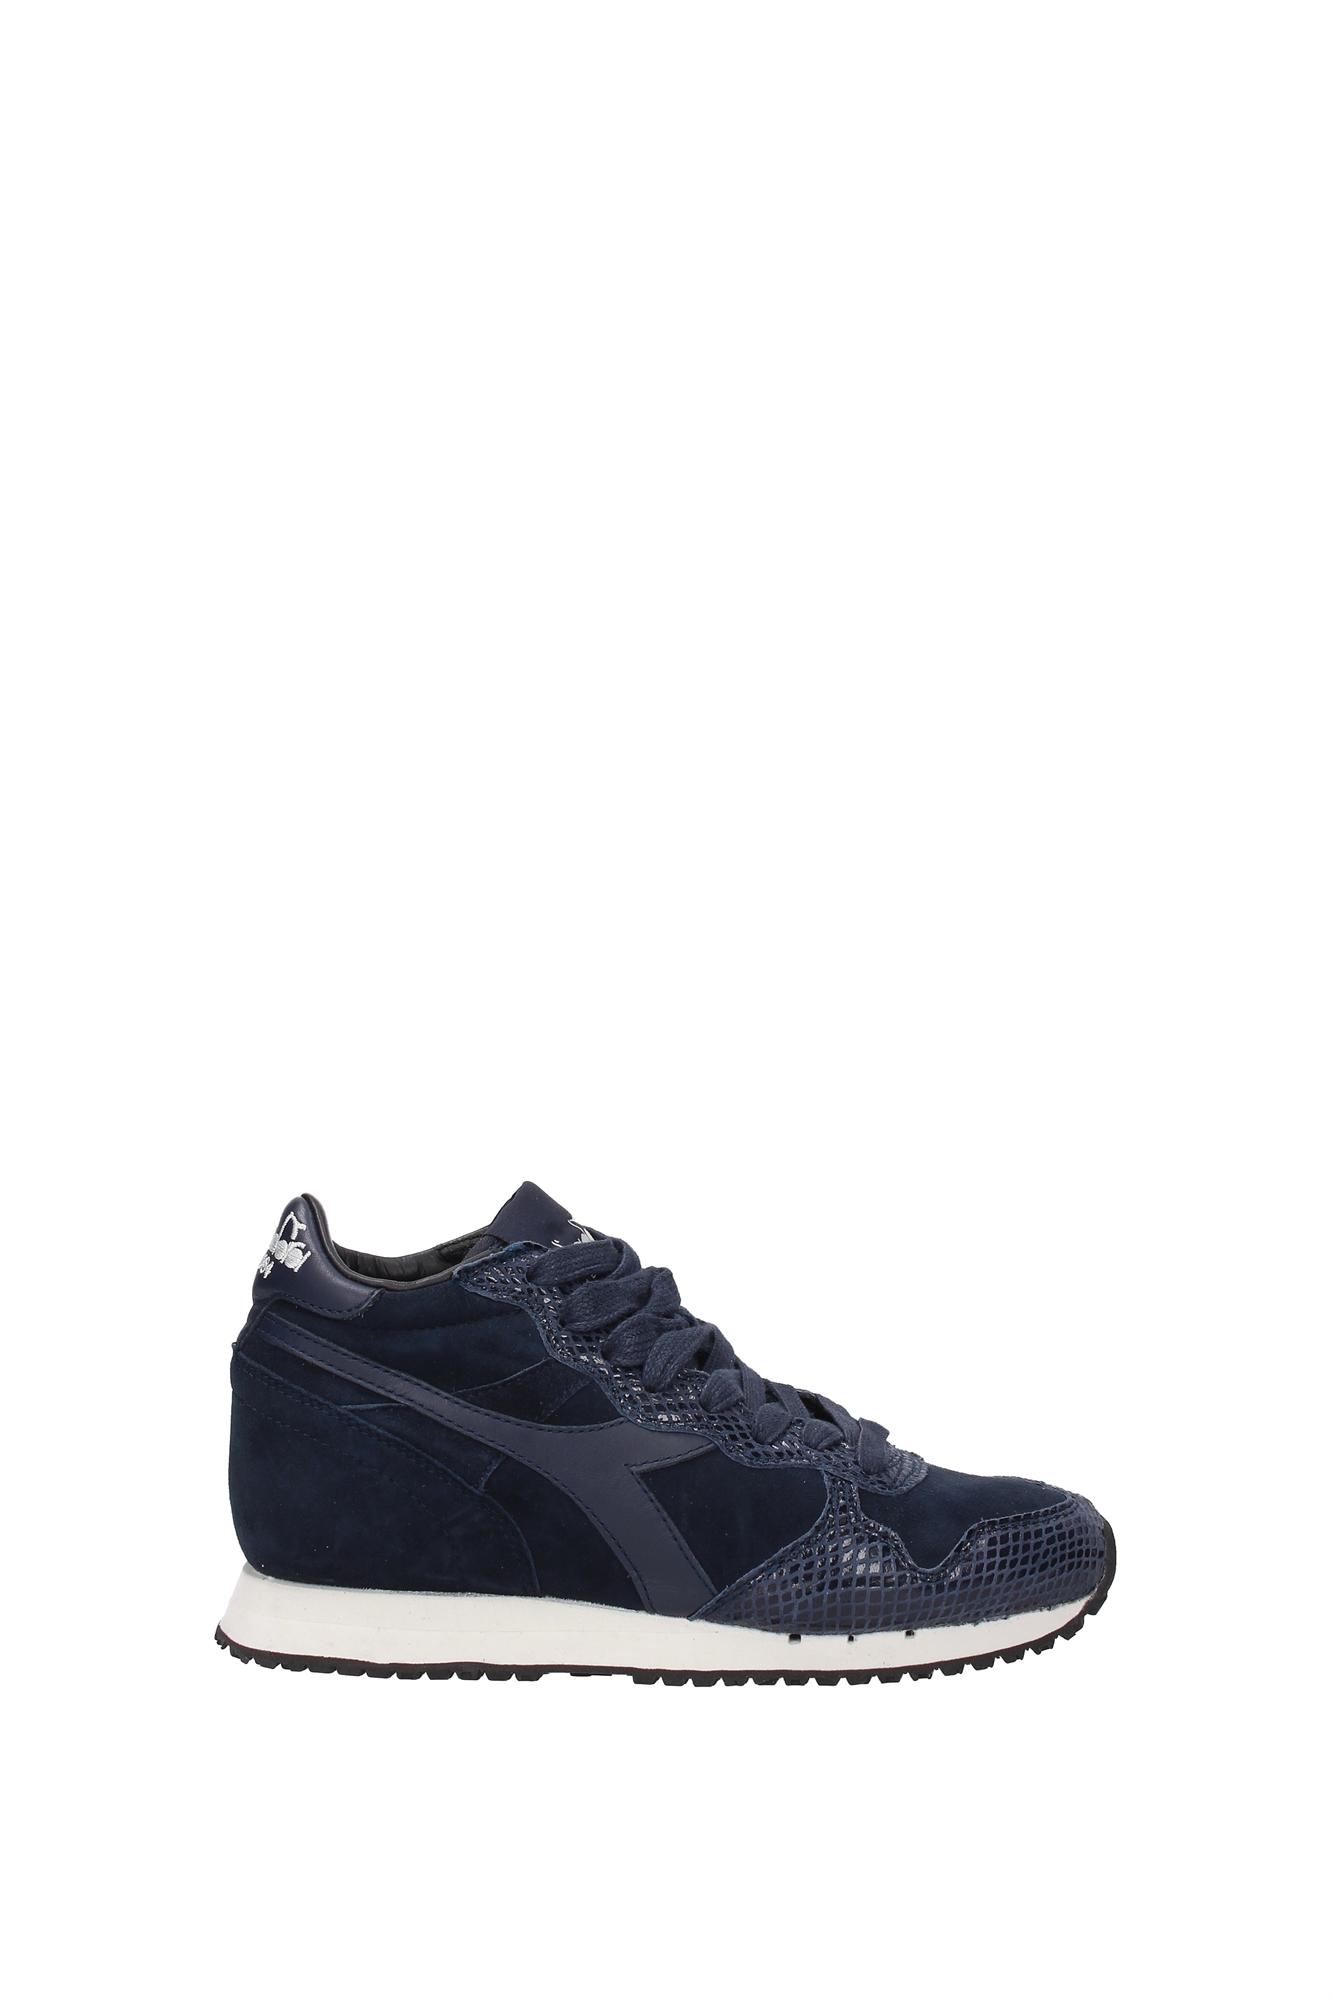 Sneakers Diadora (2011618950160065) Heritage Damen -  (2011618950160065) Diadora 9b1c44